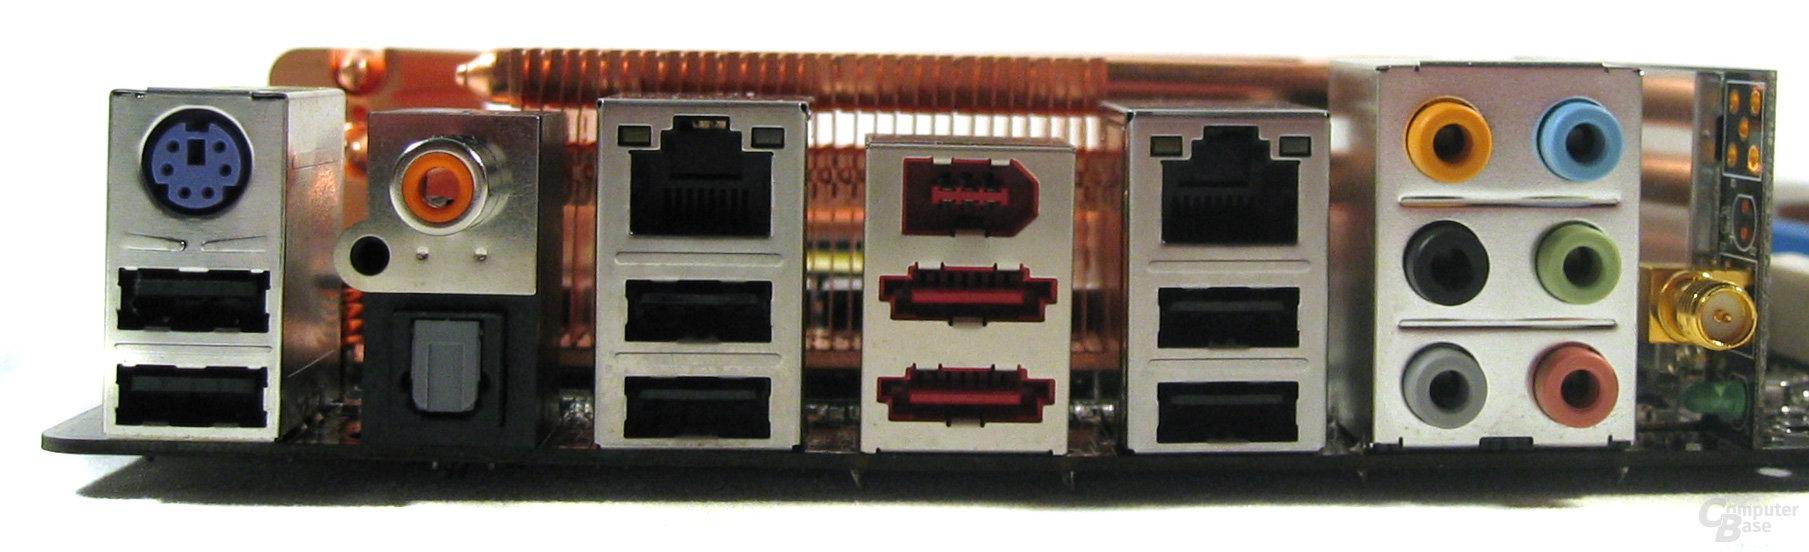 Asus P5K3 Deluxe – ATX-Blende